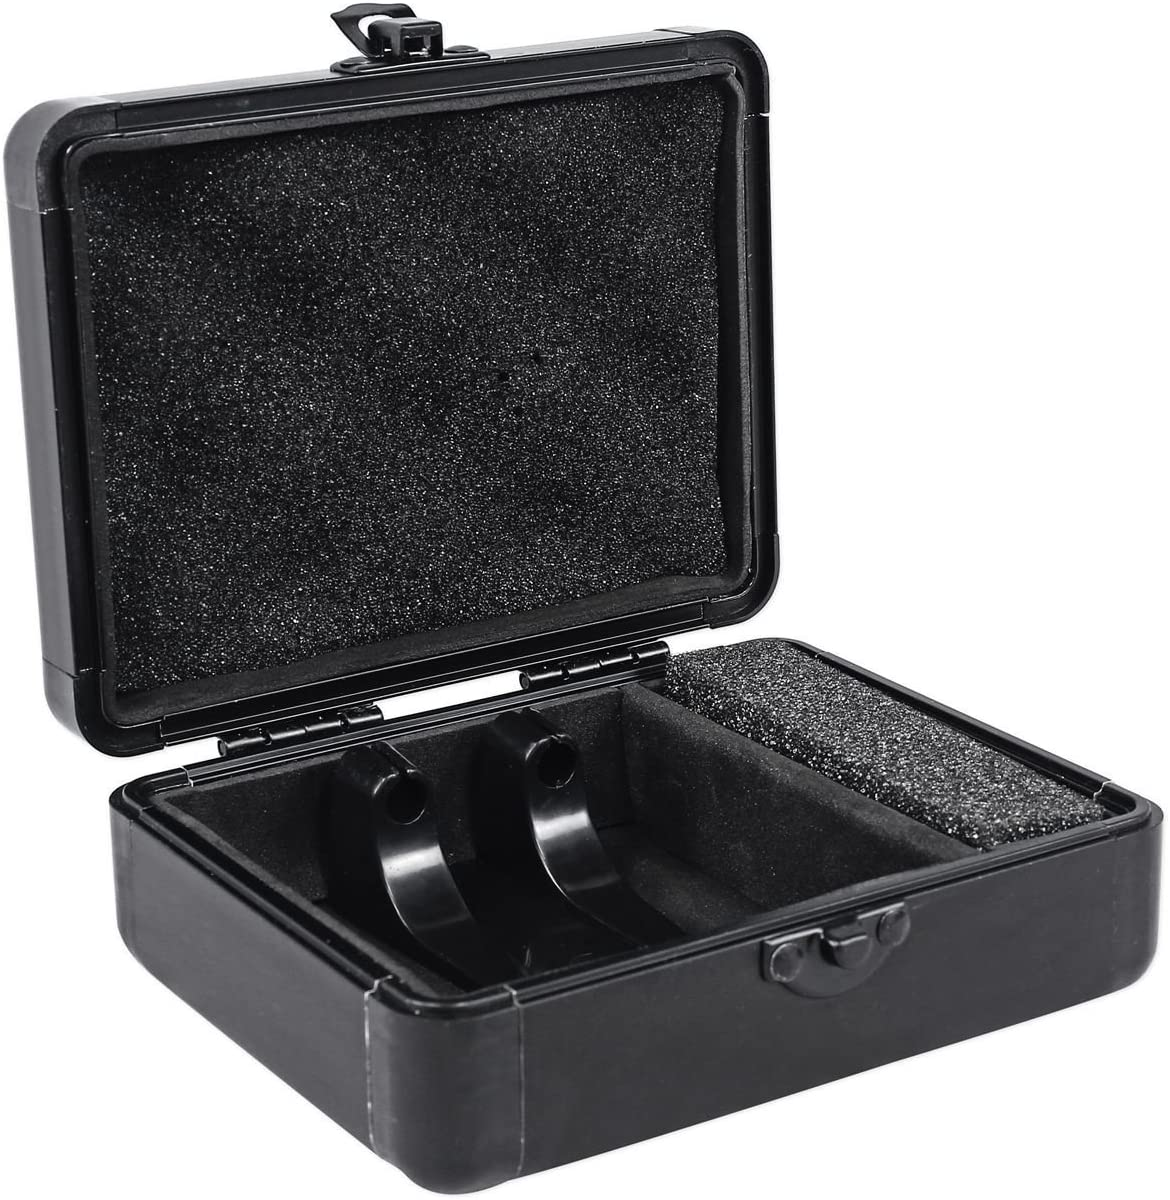 Odyssey KCC2PR2BL KROM PRO2 2x Turntable Needle Cartridge Travel Cases Black 2